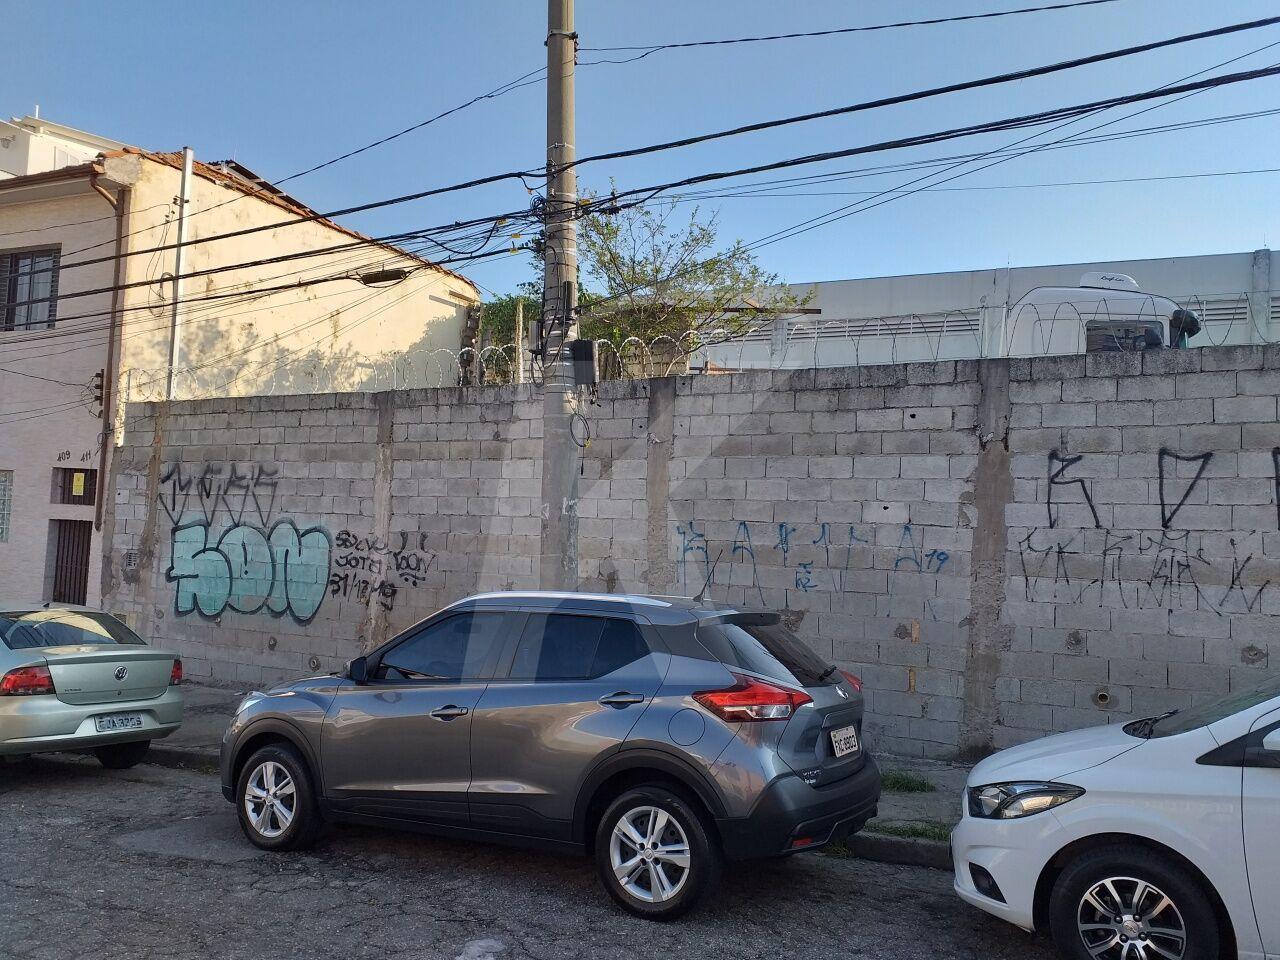 Terreno Casa Verde -  Dormitório(s) - São Paulo - SP - REF. KA14285